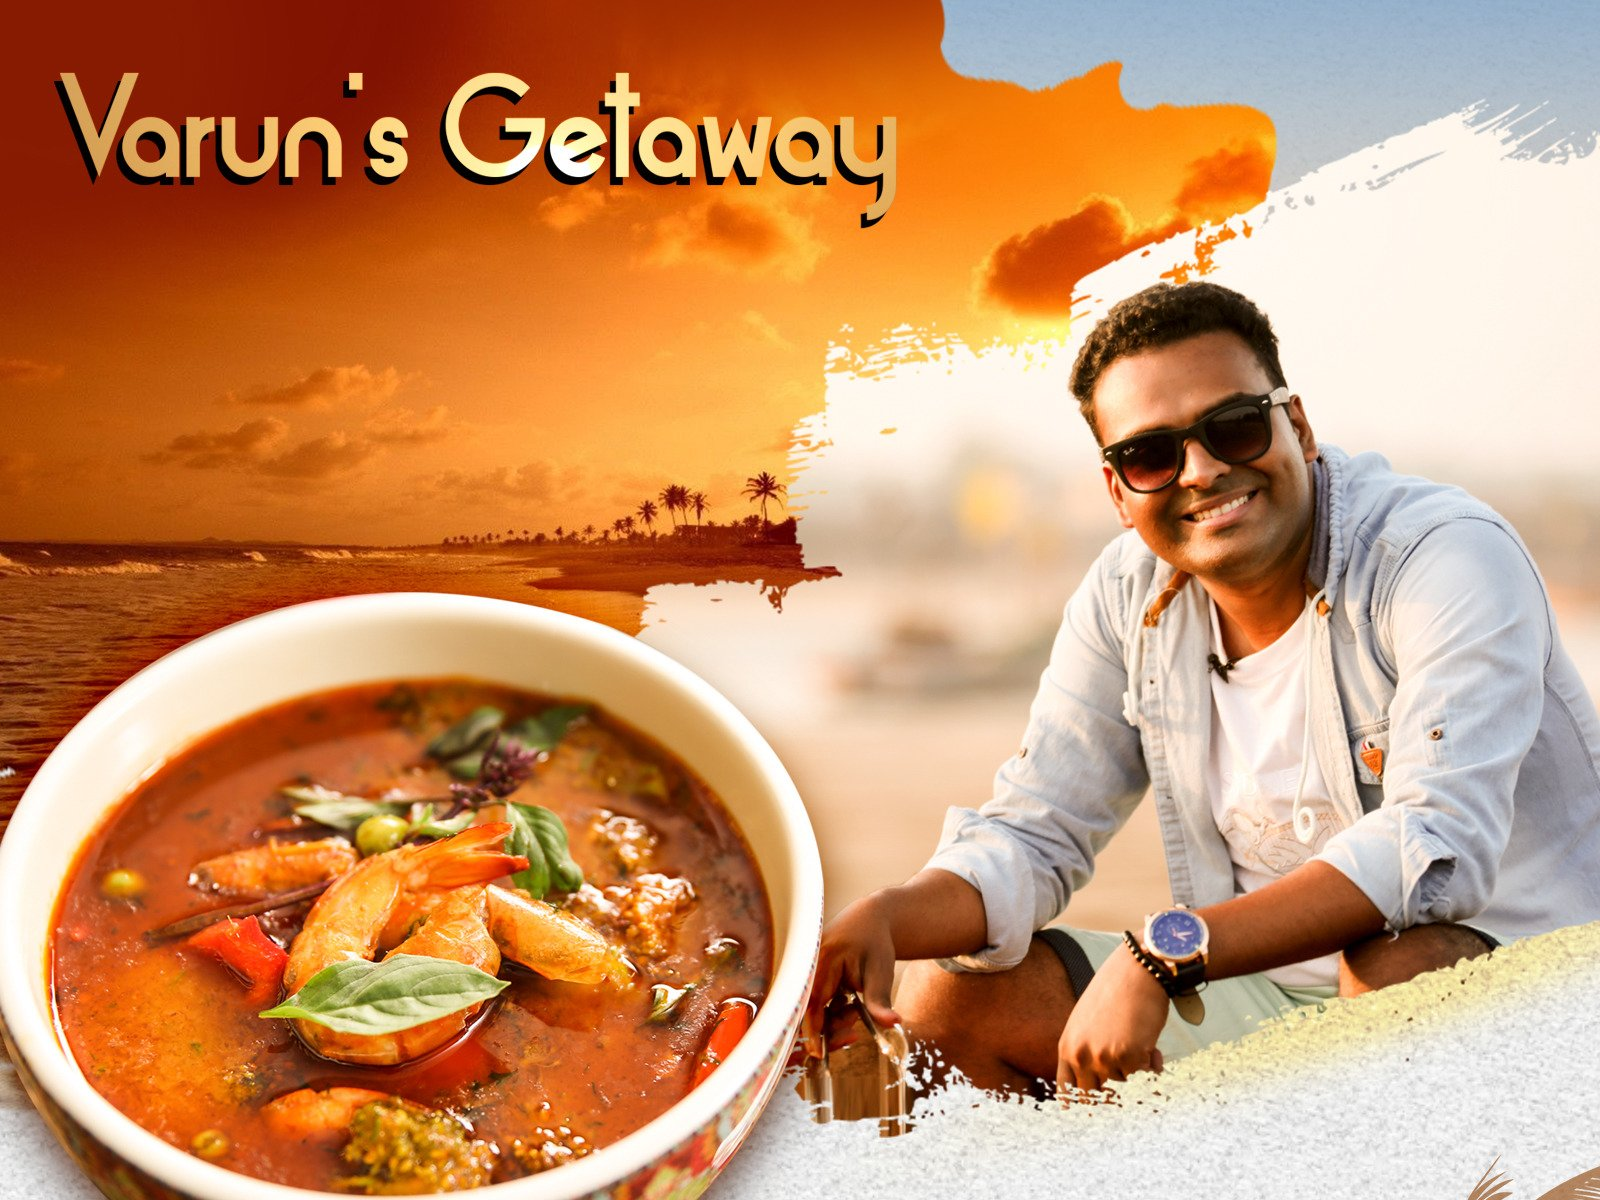 Varun's Getaway - Season 1